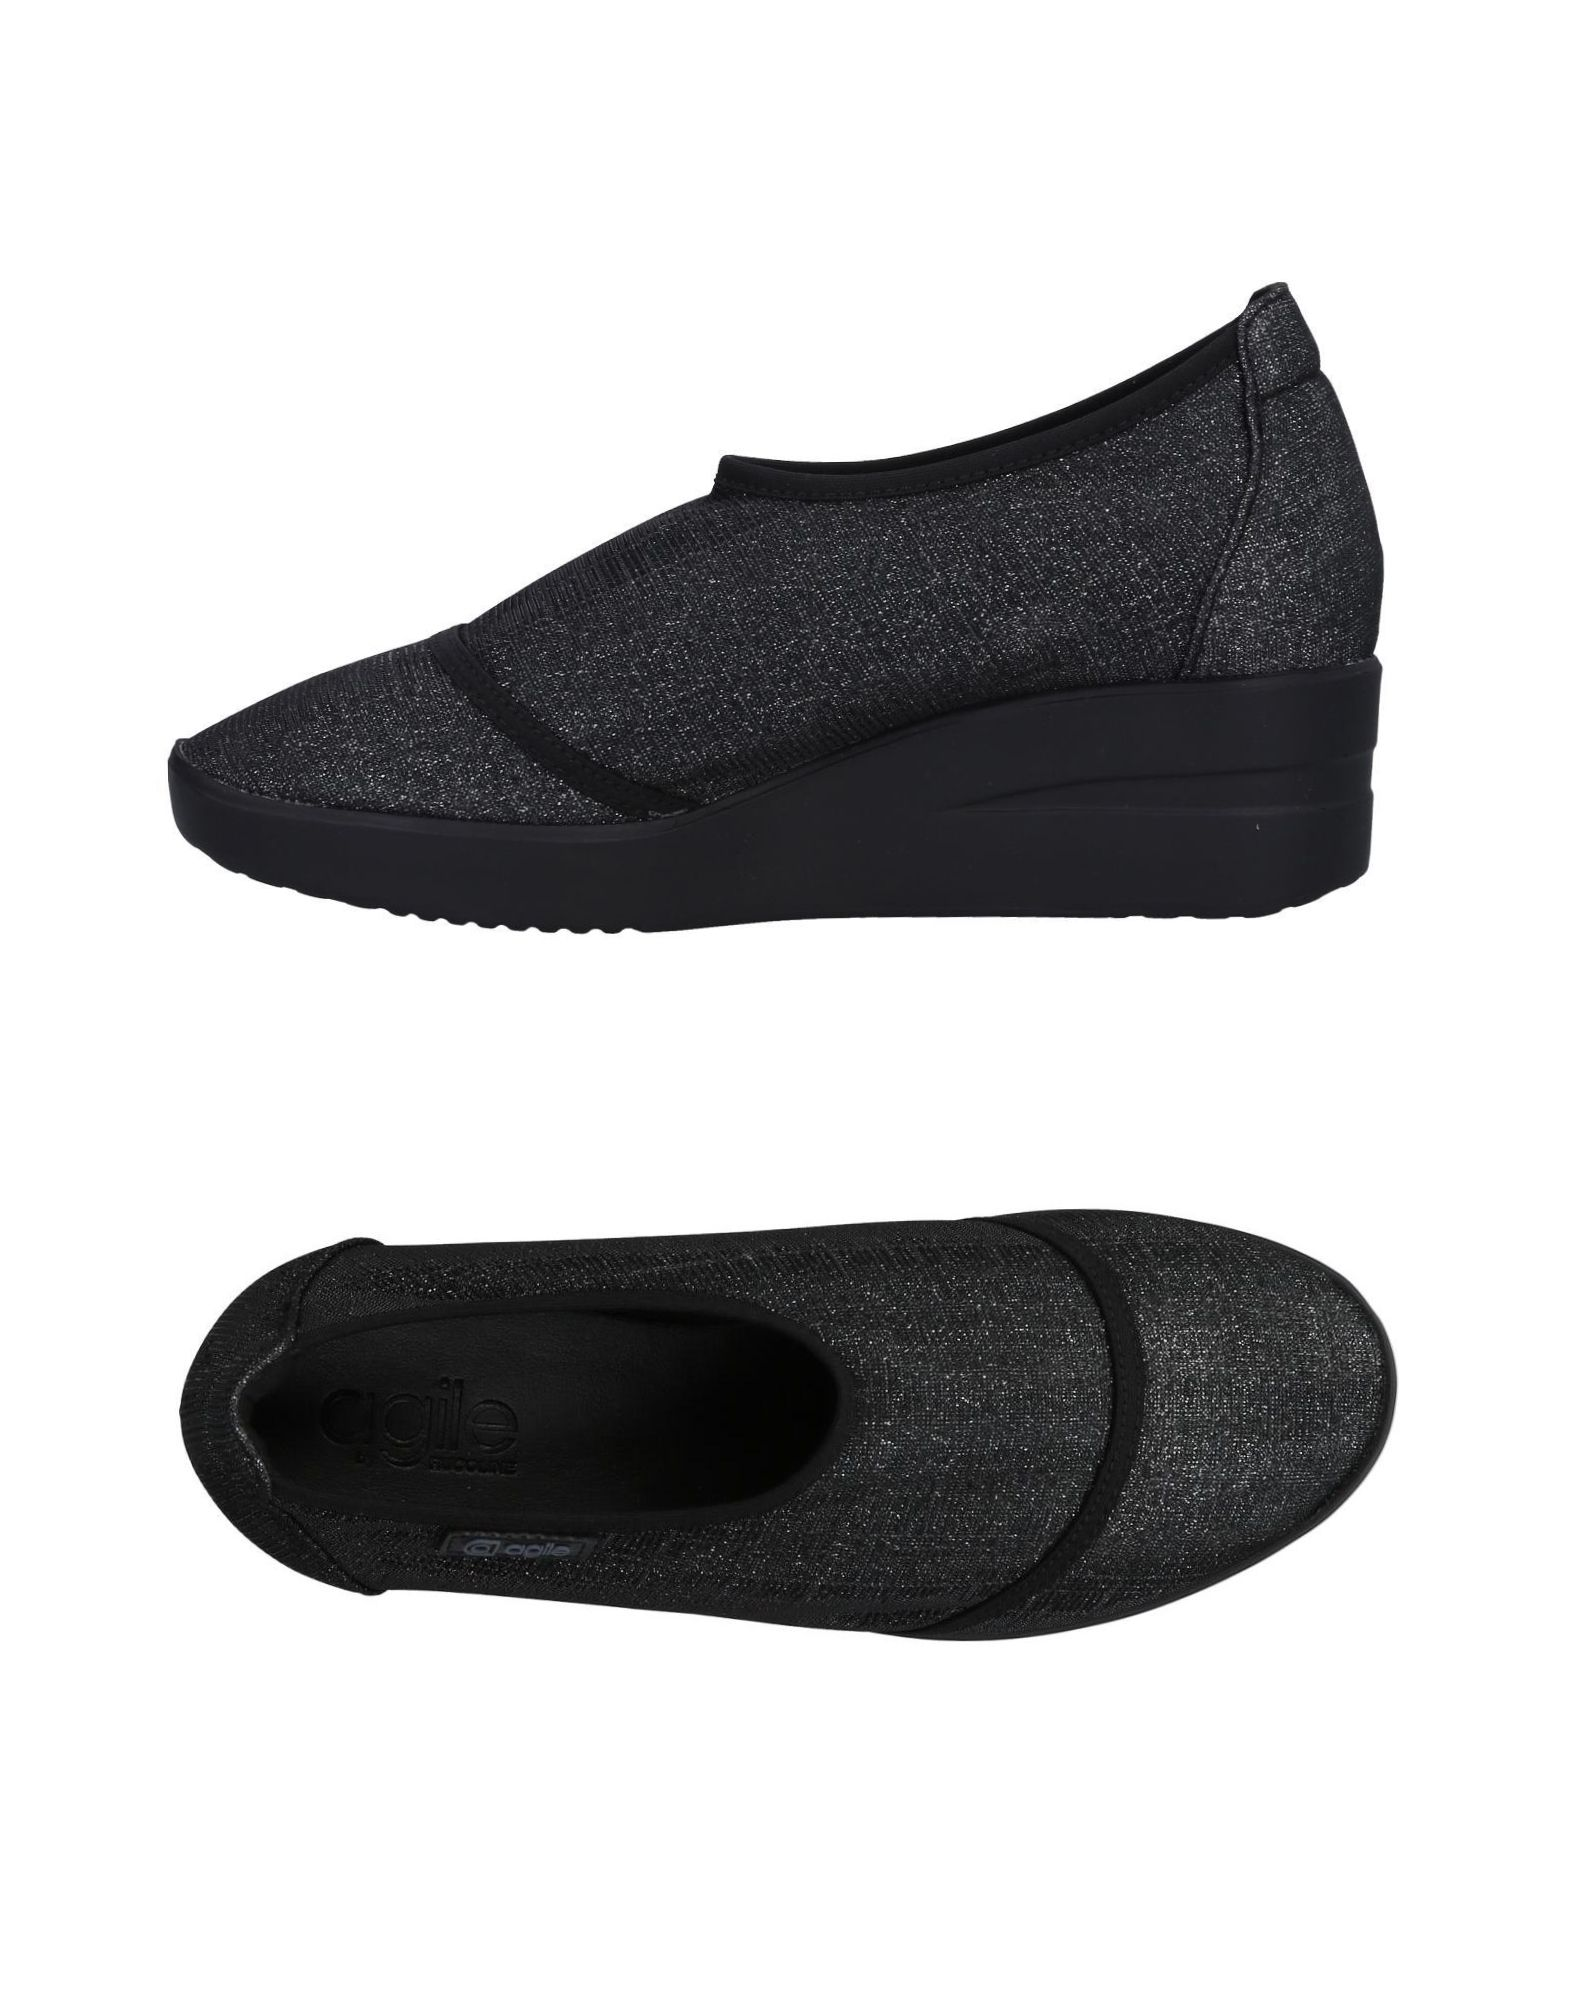 Agile By Rucoline Pumps Damen  11496719OB Gute Qualität beliebte Schuhe